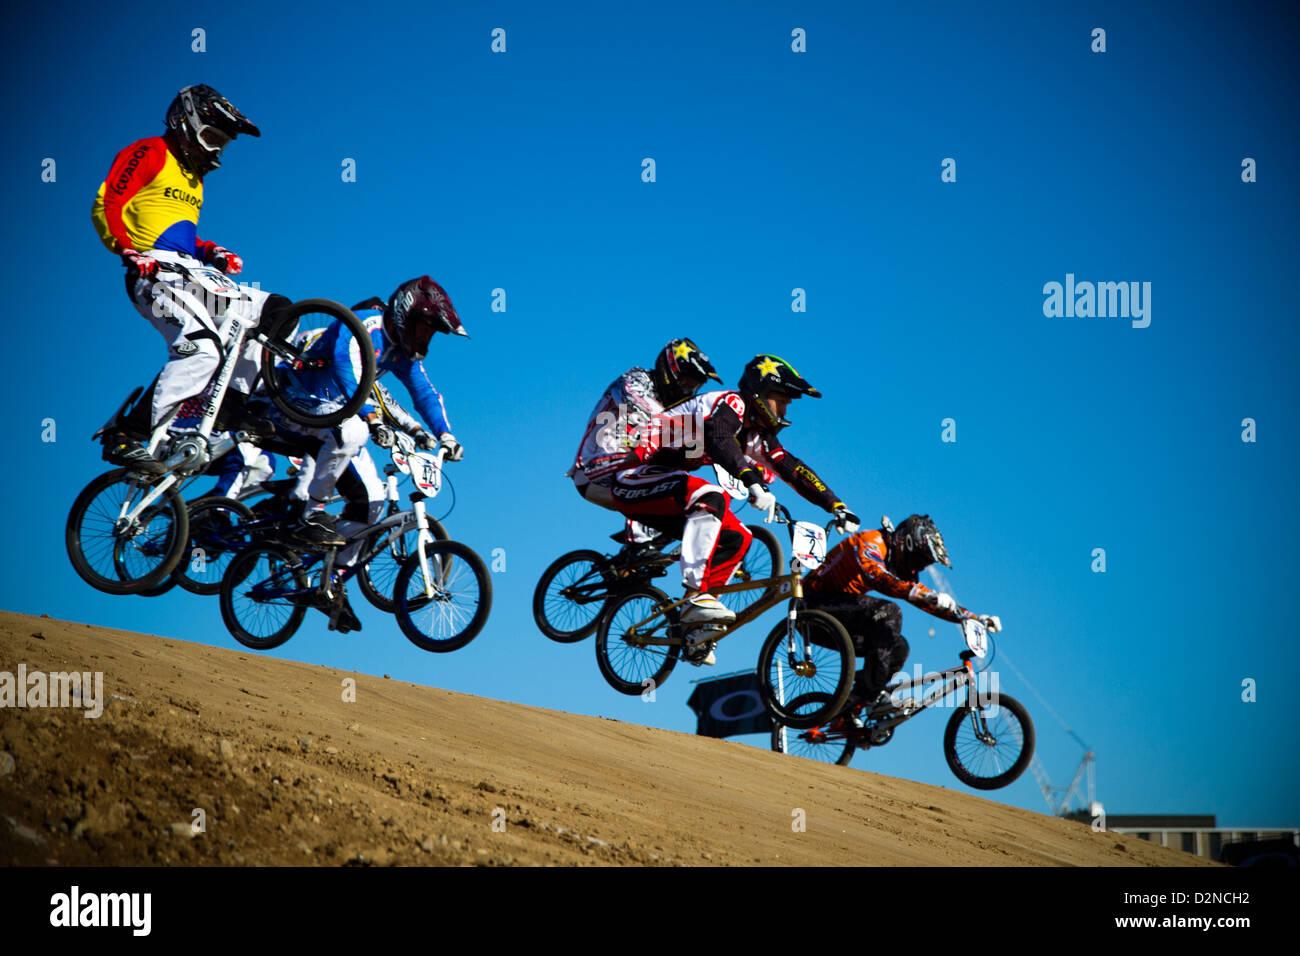 bmx race at olympics park london - Stock Image